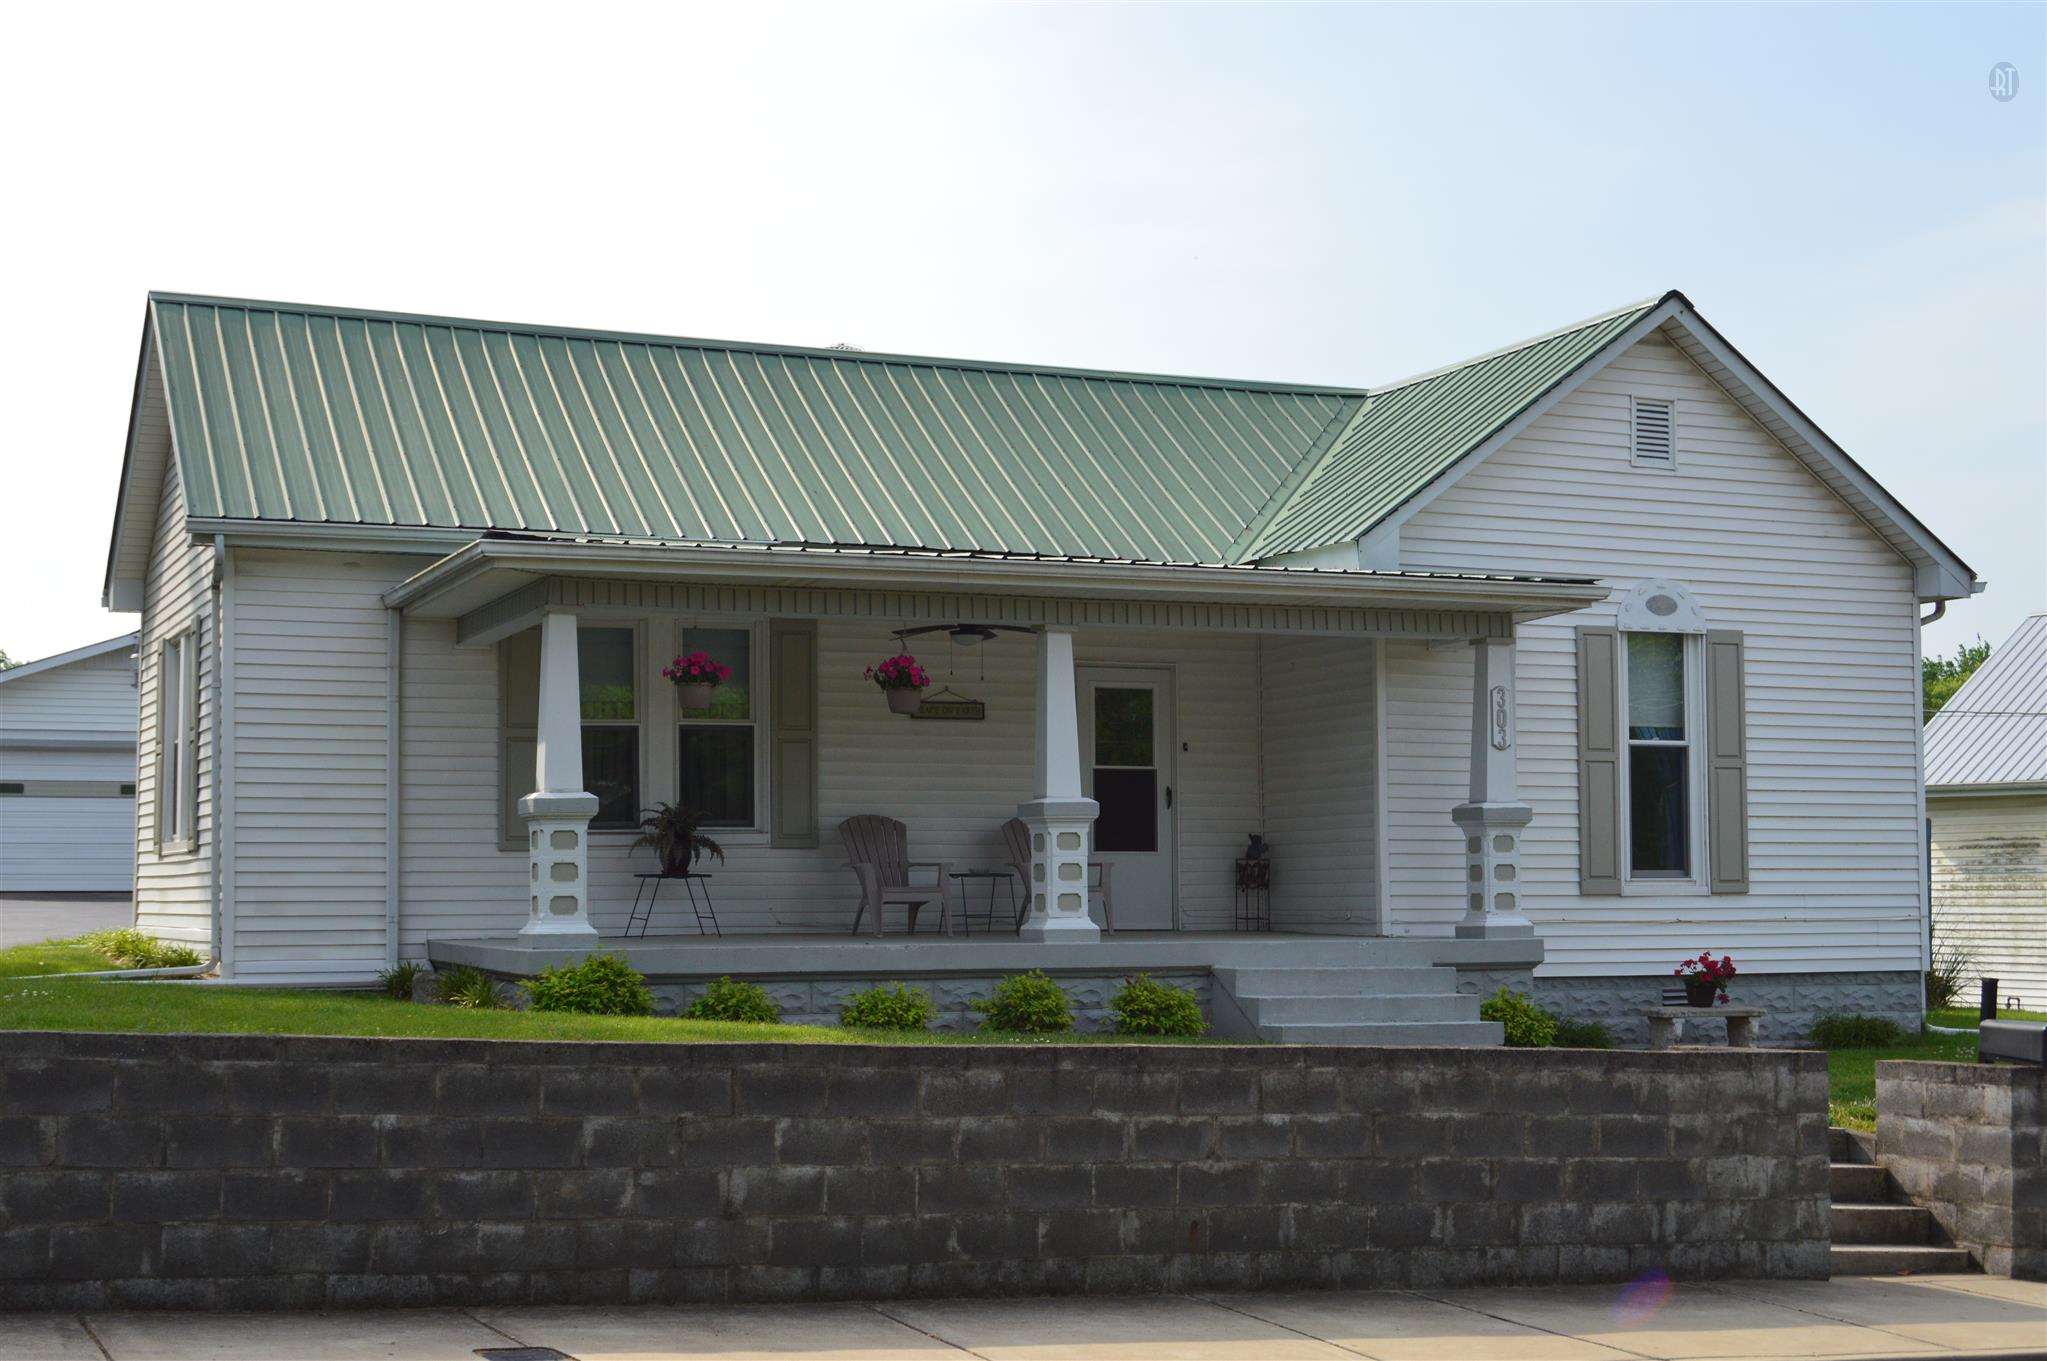 303 S Main St, Mount Pleasant, TN 38474